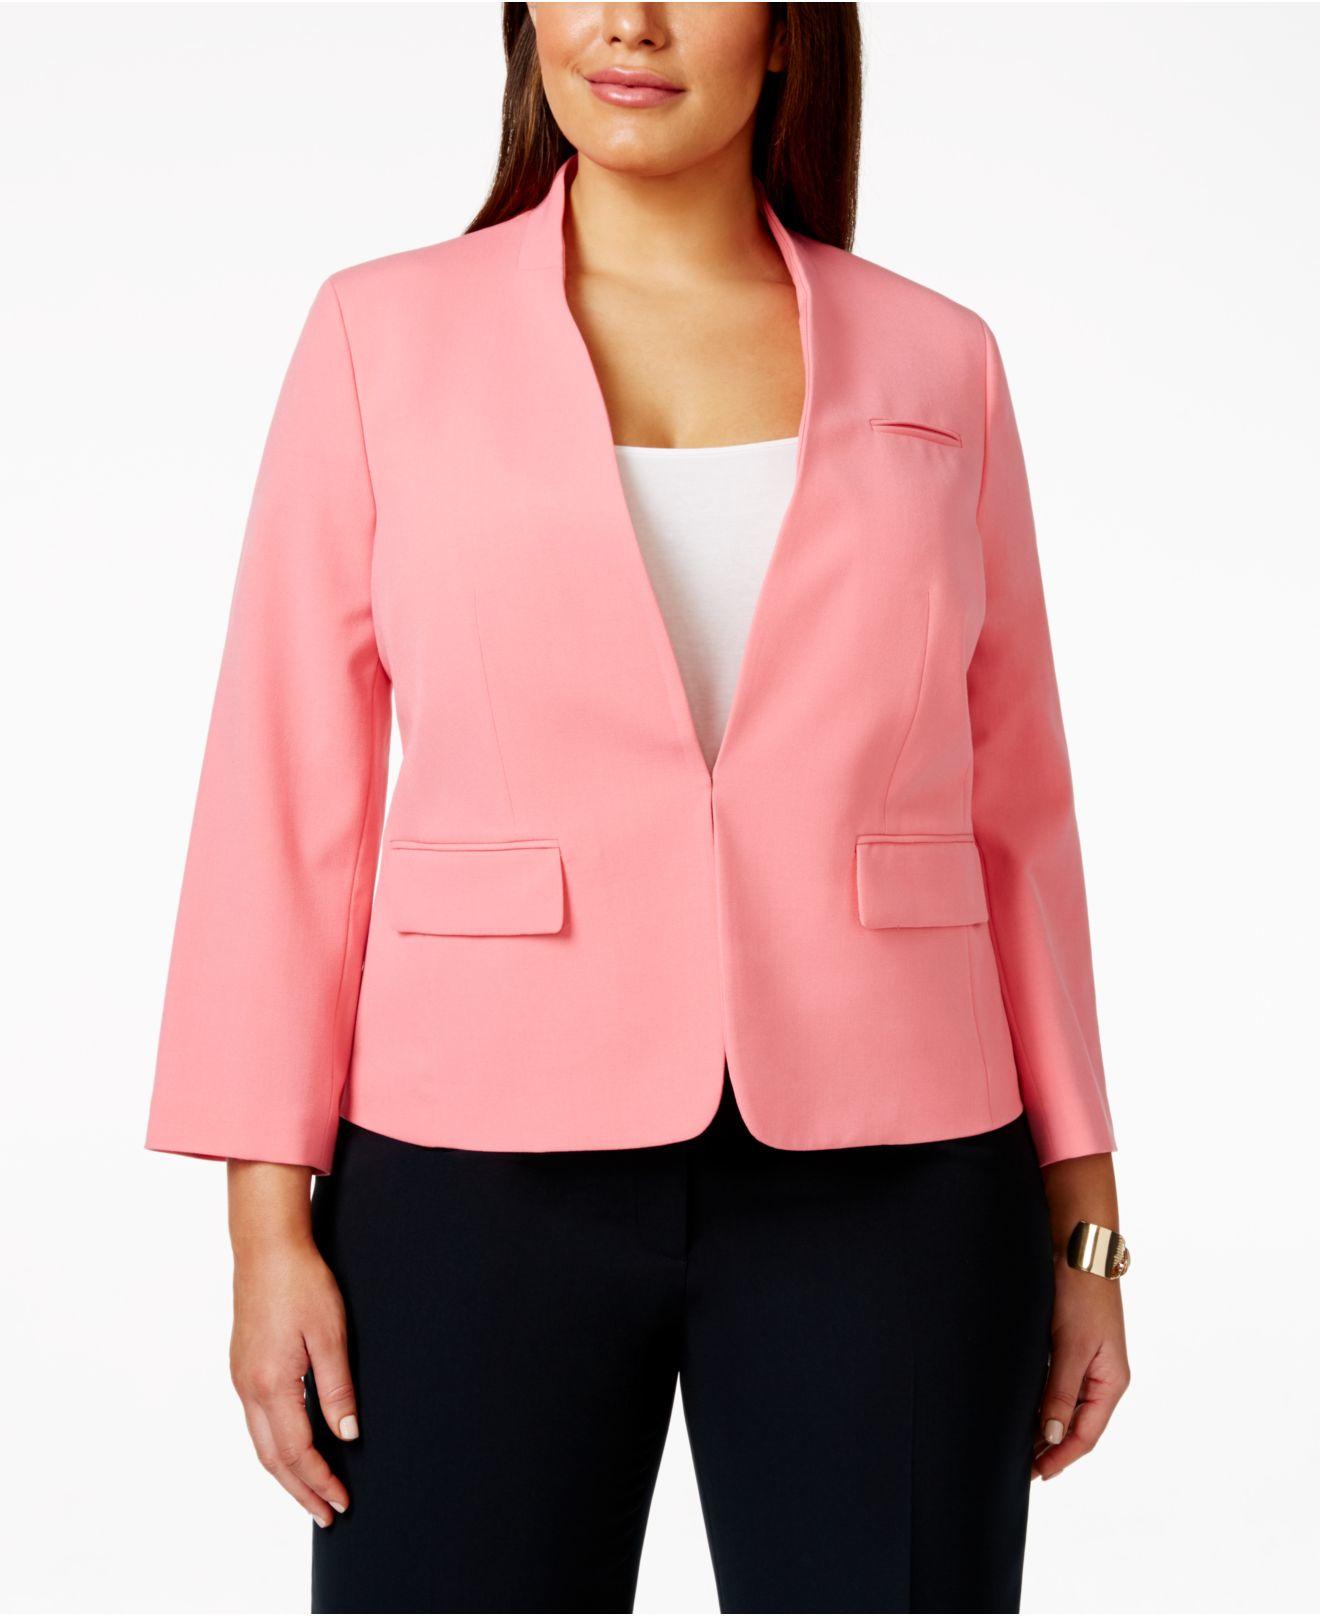 mundo-halflife.tk: women suit jacket plus size. From The Community. Amazon Try Prime All Comfy-Women Blazer Plus-Size Mid-Long Notch Lapel Patch Suit Coat. by Comfy-Women. $ - $ $ 29 $ 39 4 out of 5 stars 1. Calvin Klein Women's Plus Size Two Button Lux Blazer. by .